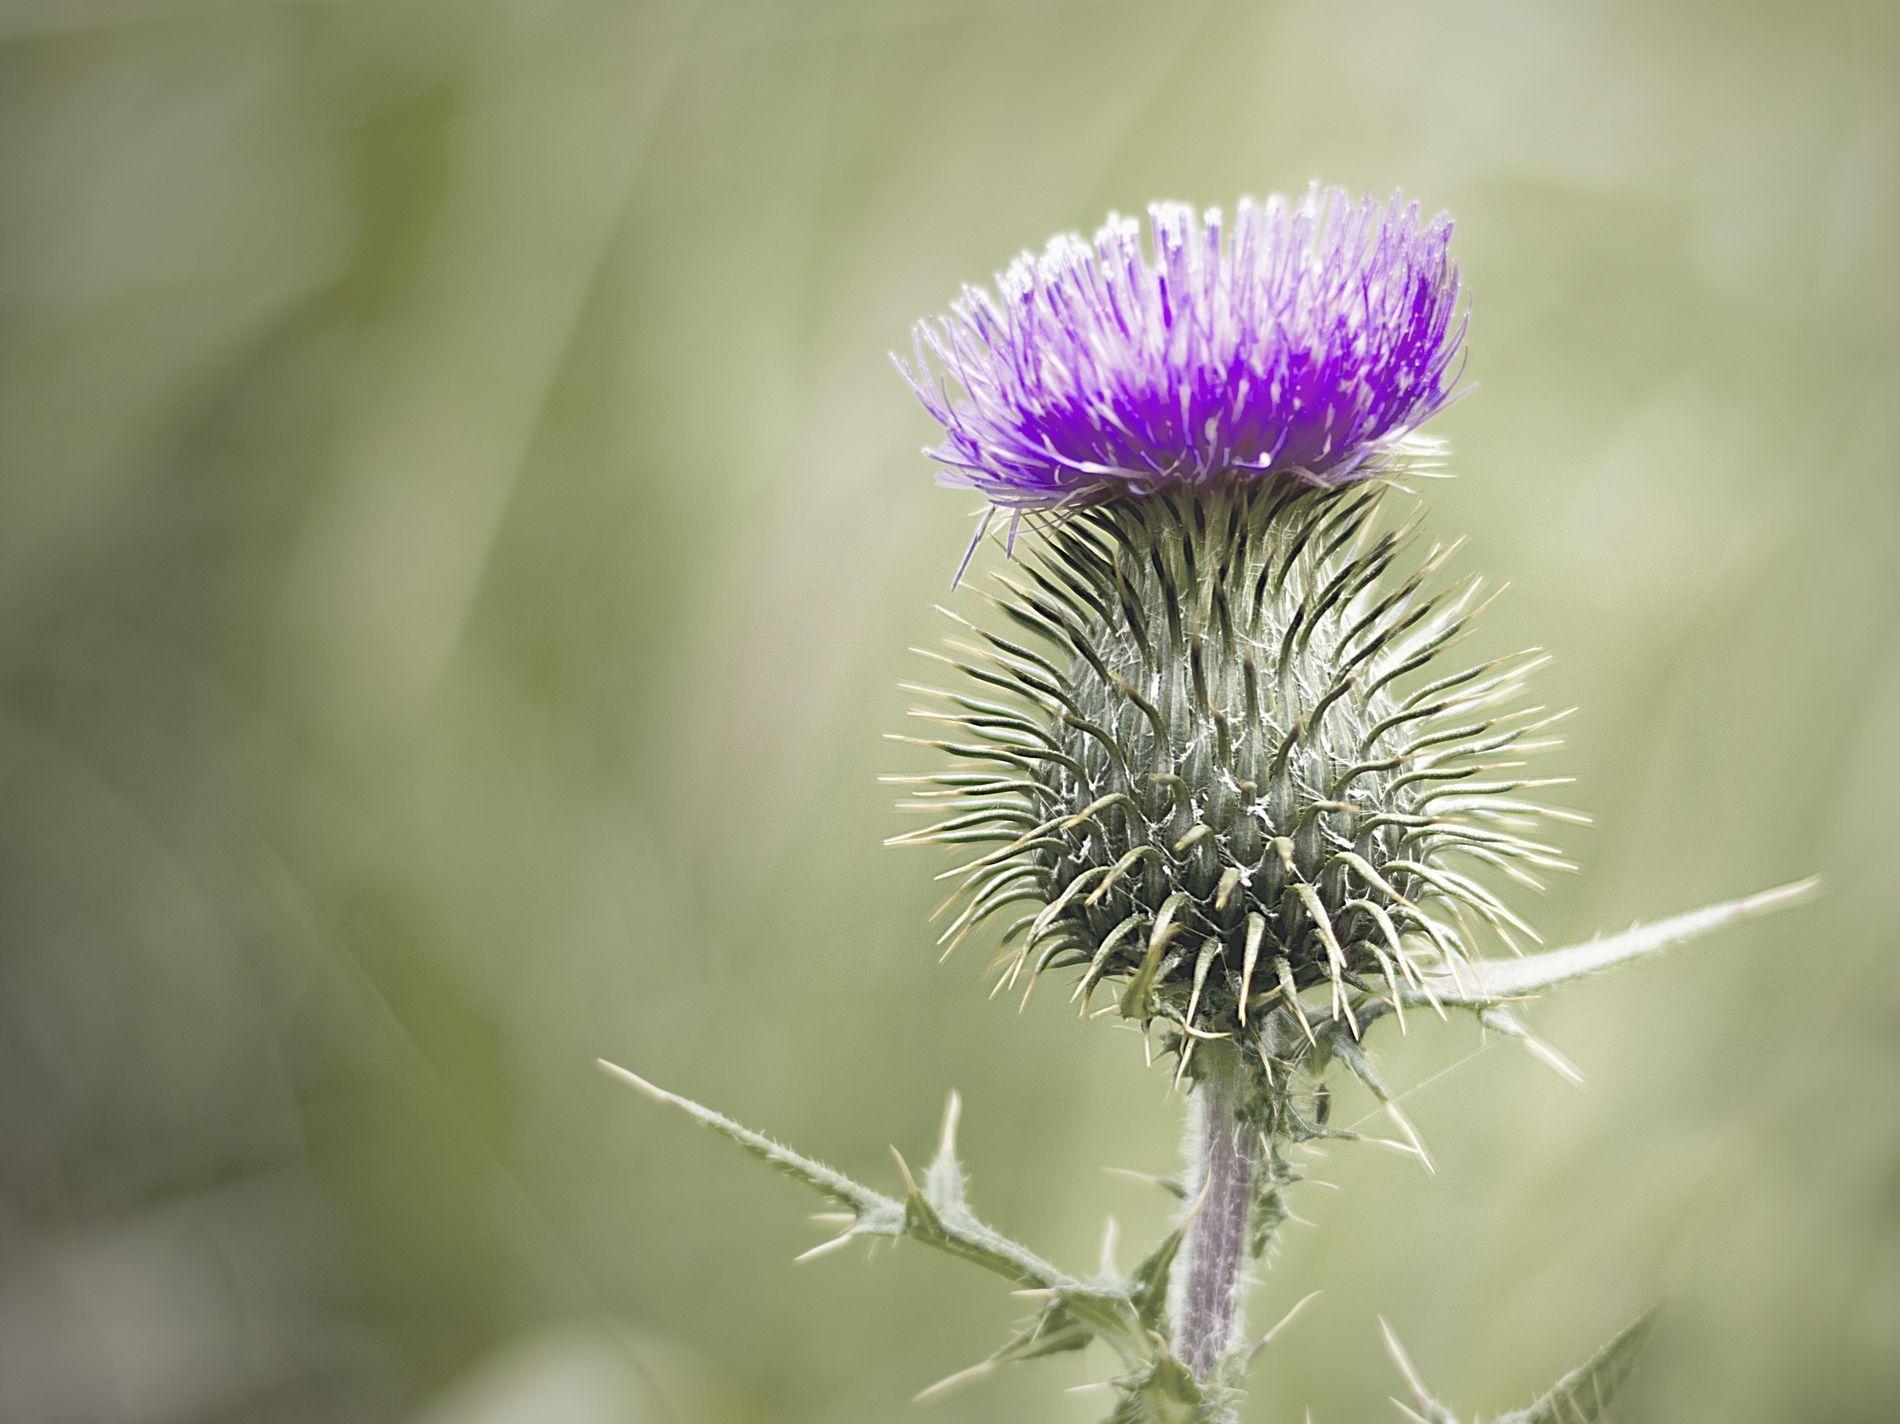 Thistle by Trine Schack ֎ Scotland national flower